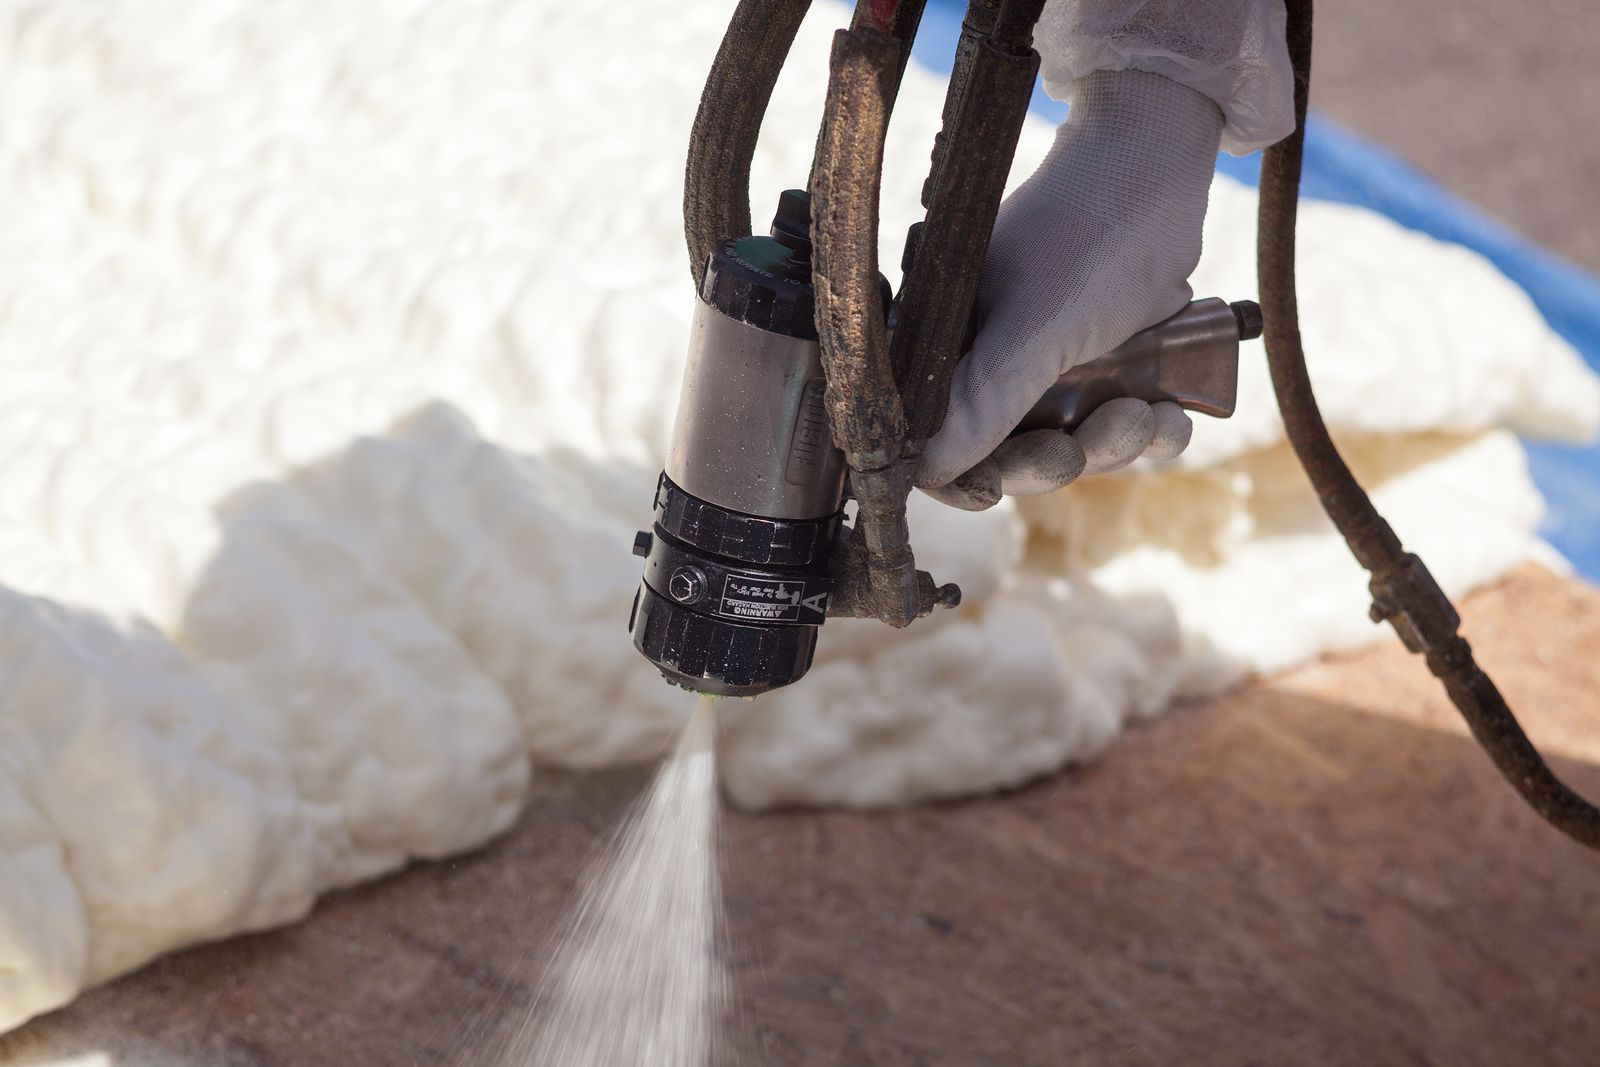 Houston Spray Foam Pros Insulation Contractors 1925 Miller St Houston Tx 77003 713 497 1108 Https Diy Insulation Foam Insulation Spray Foam Insulation